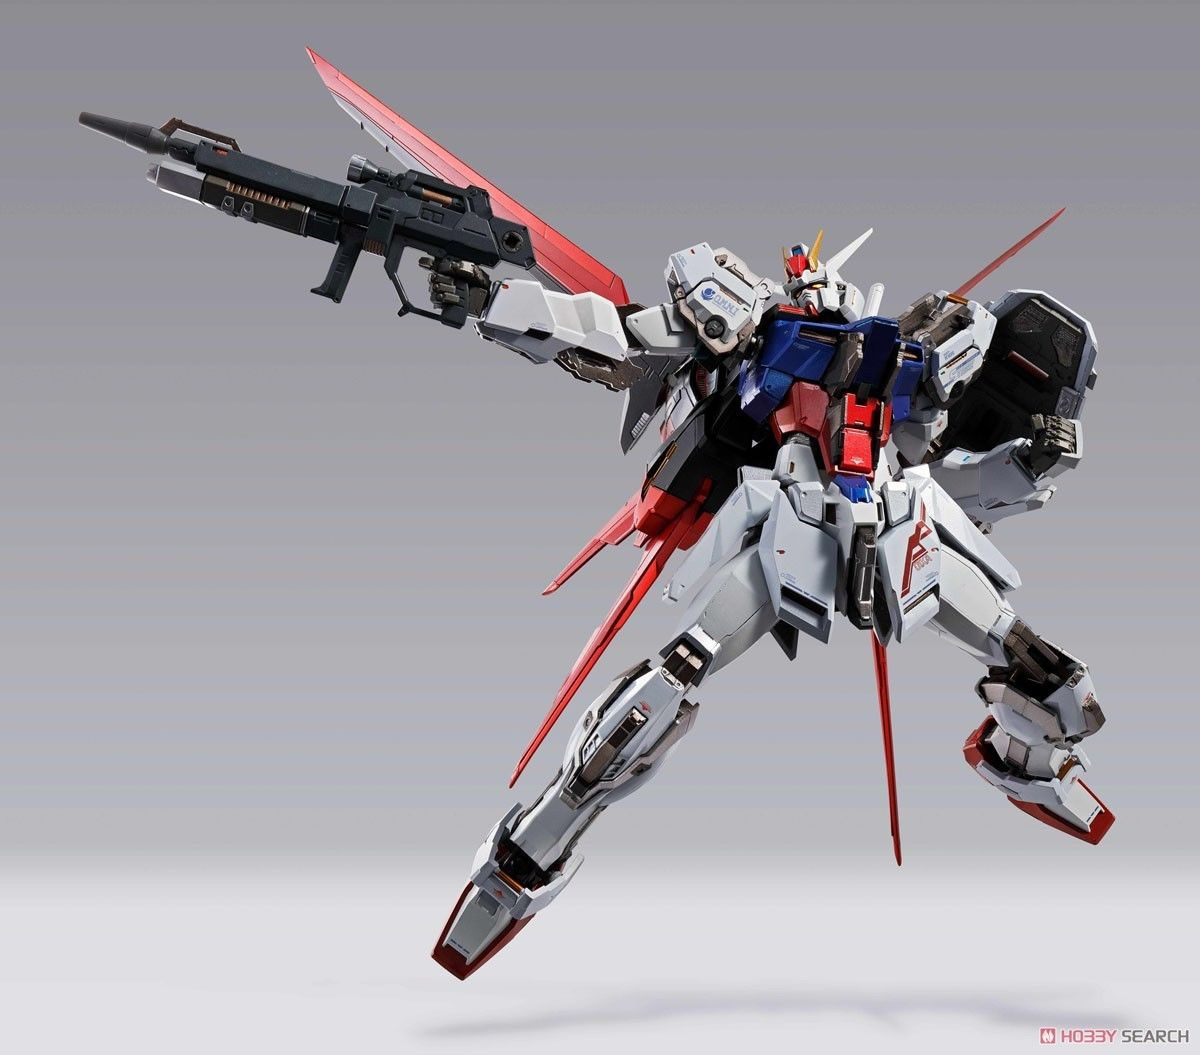 MOBILE SUIT GUNDAM: GUNDAM AILE STRIKE GAT-X105 + AQM/E-X01 METAL BUILD Action Figure BANDAI